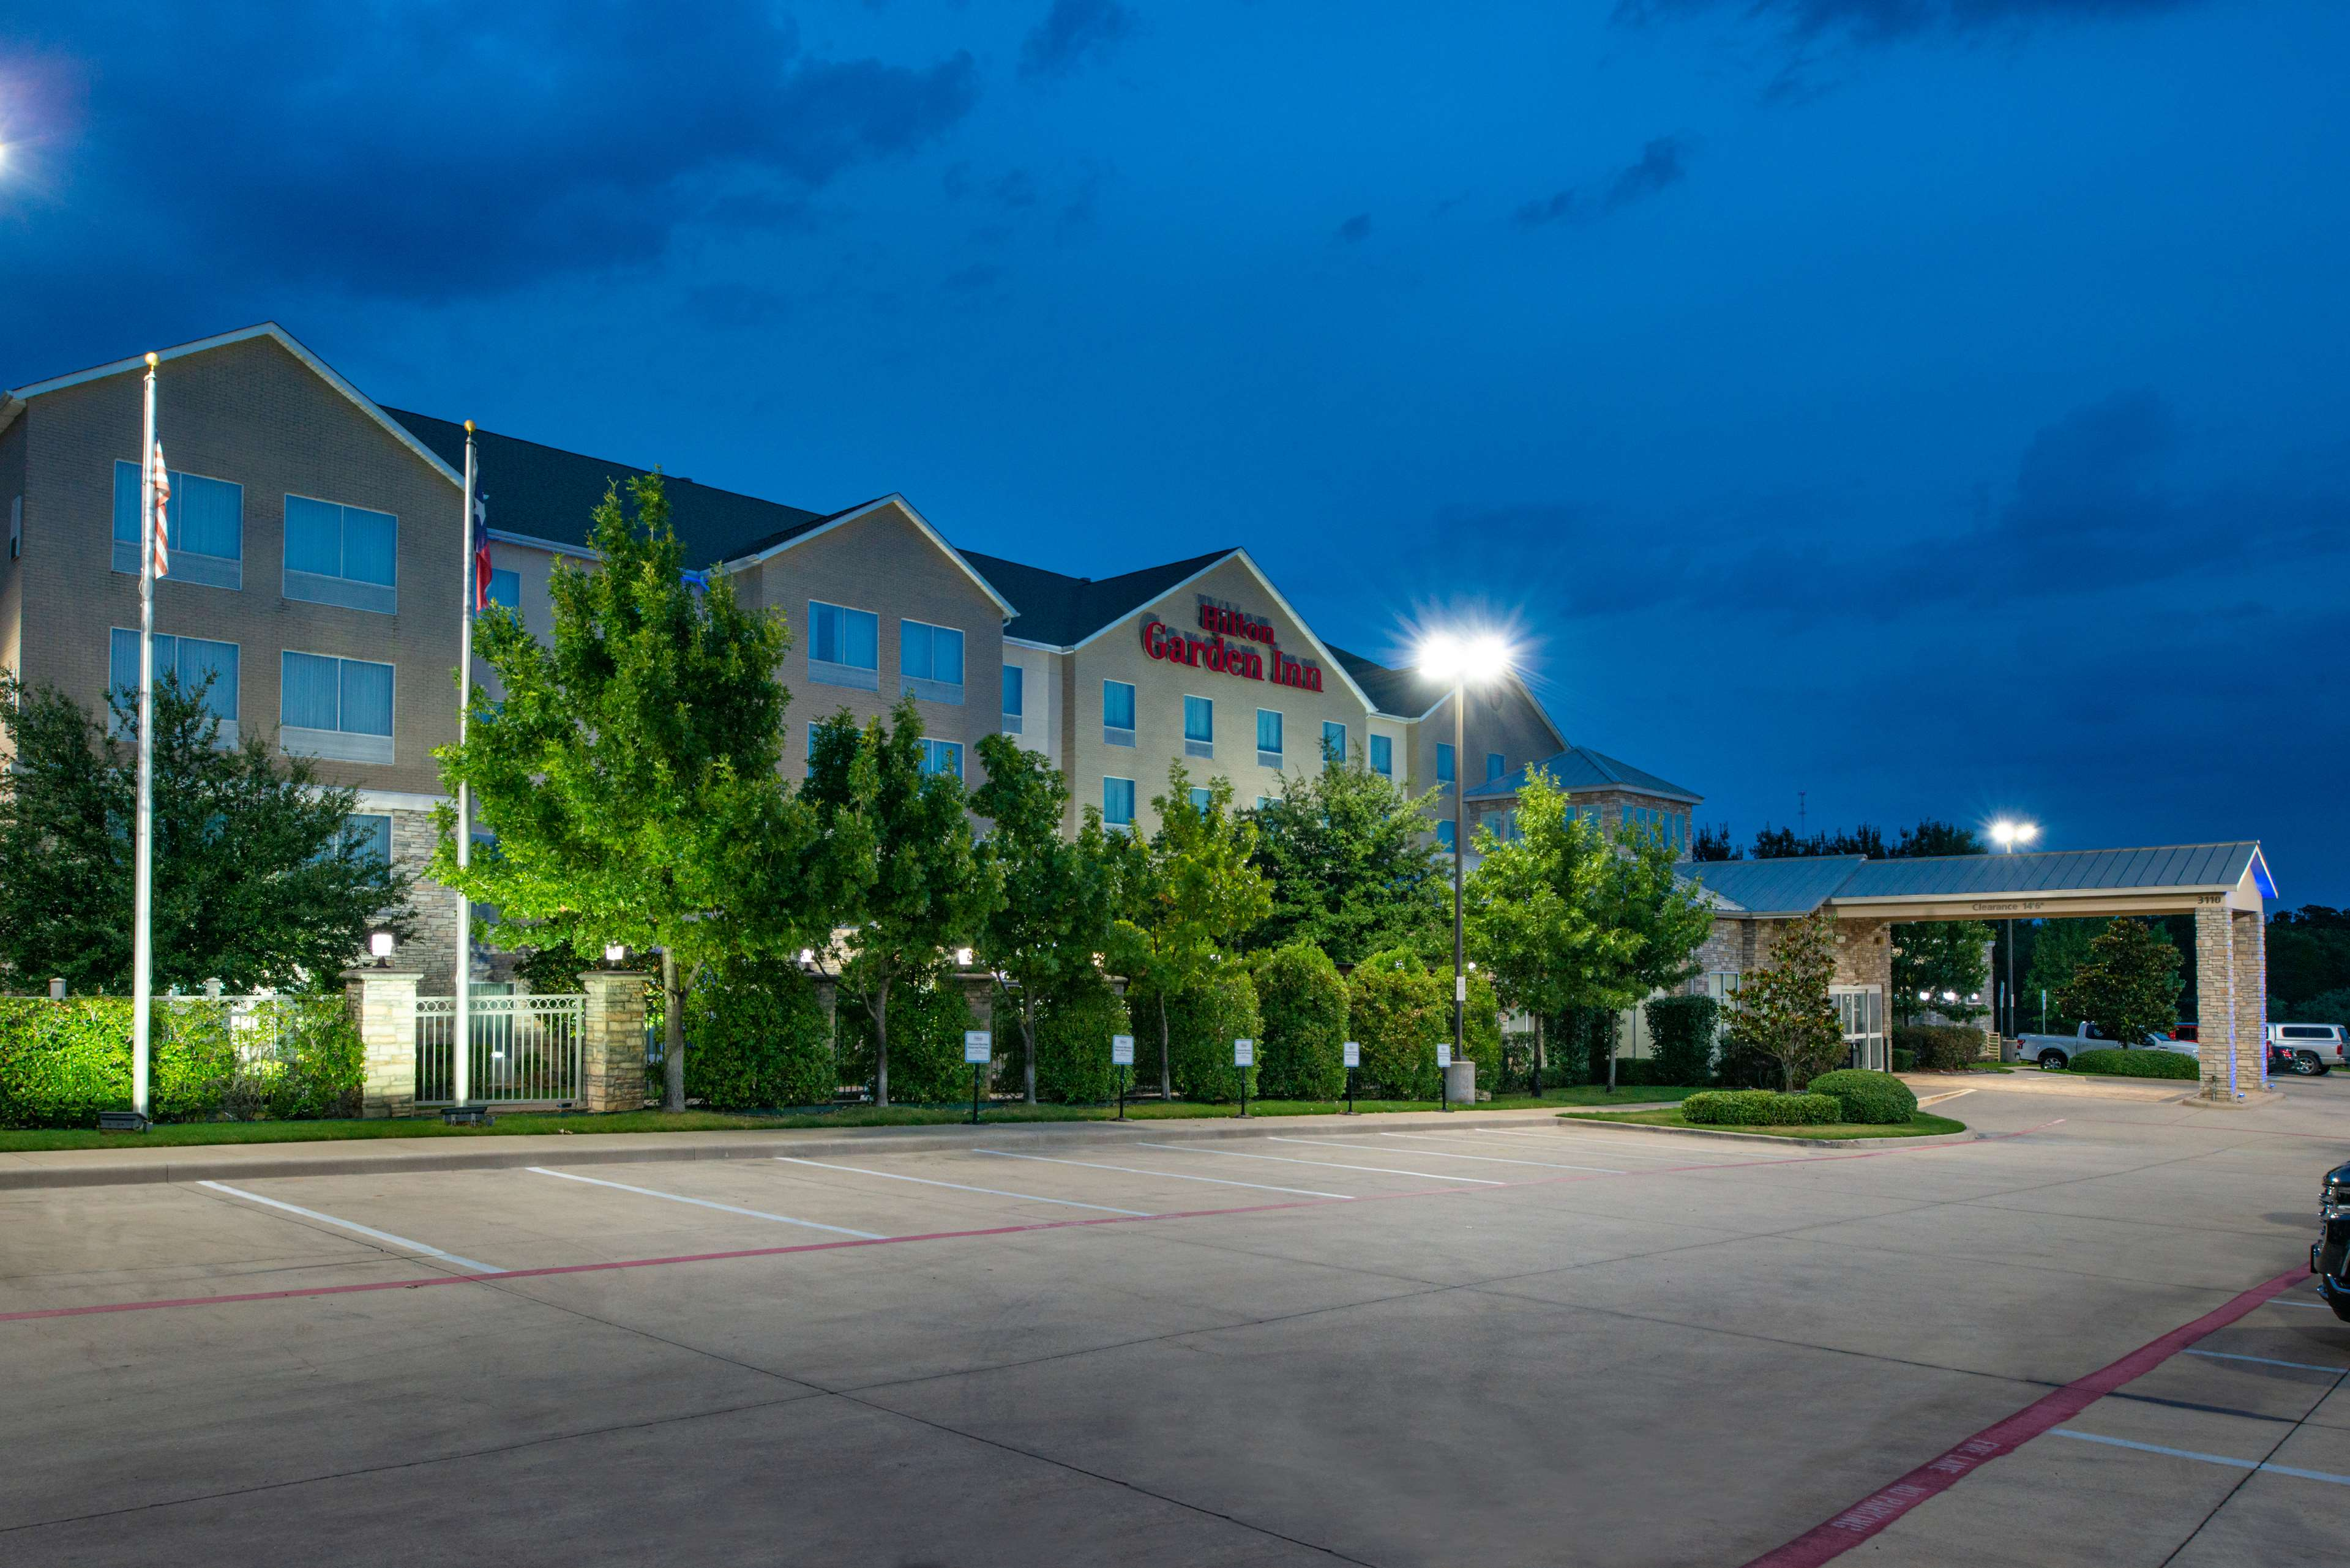 Hilton Garden Inn Denton 3110 Colorado Blvd Denton Tx Hotels Motels Mapquest